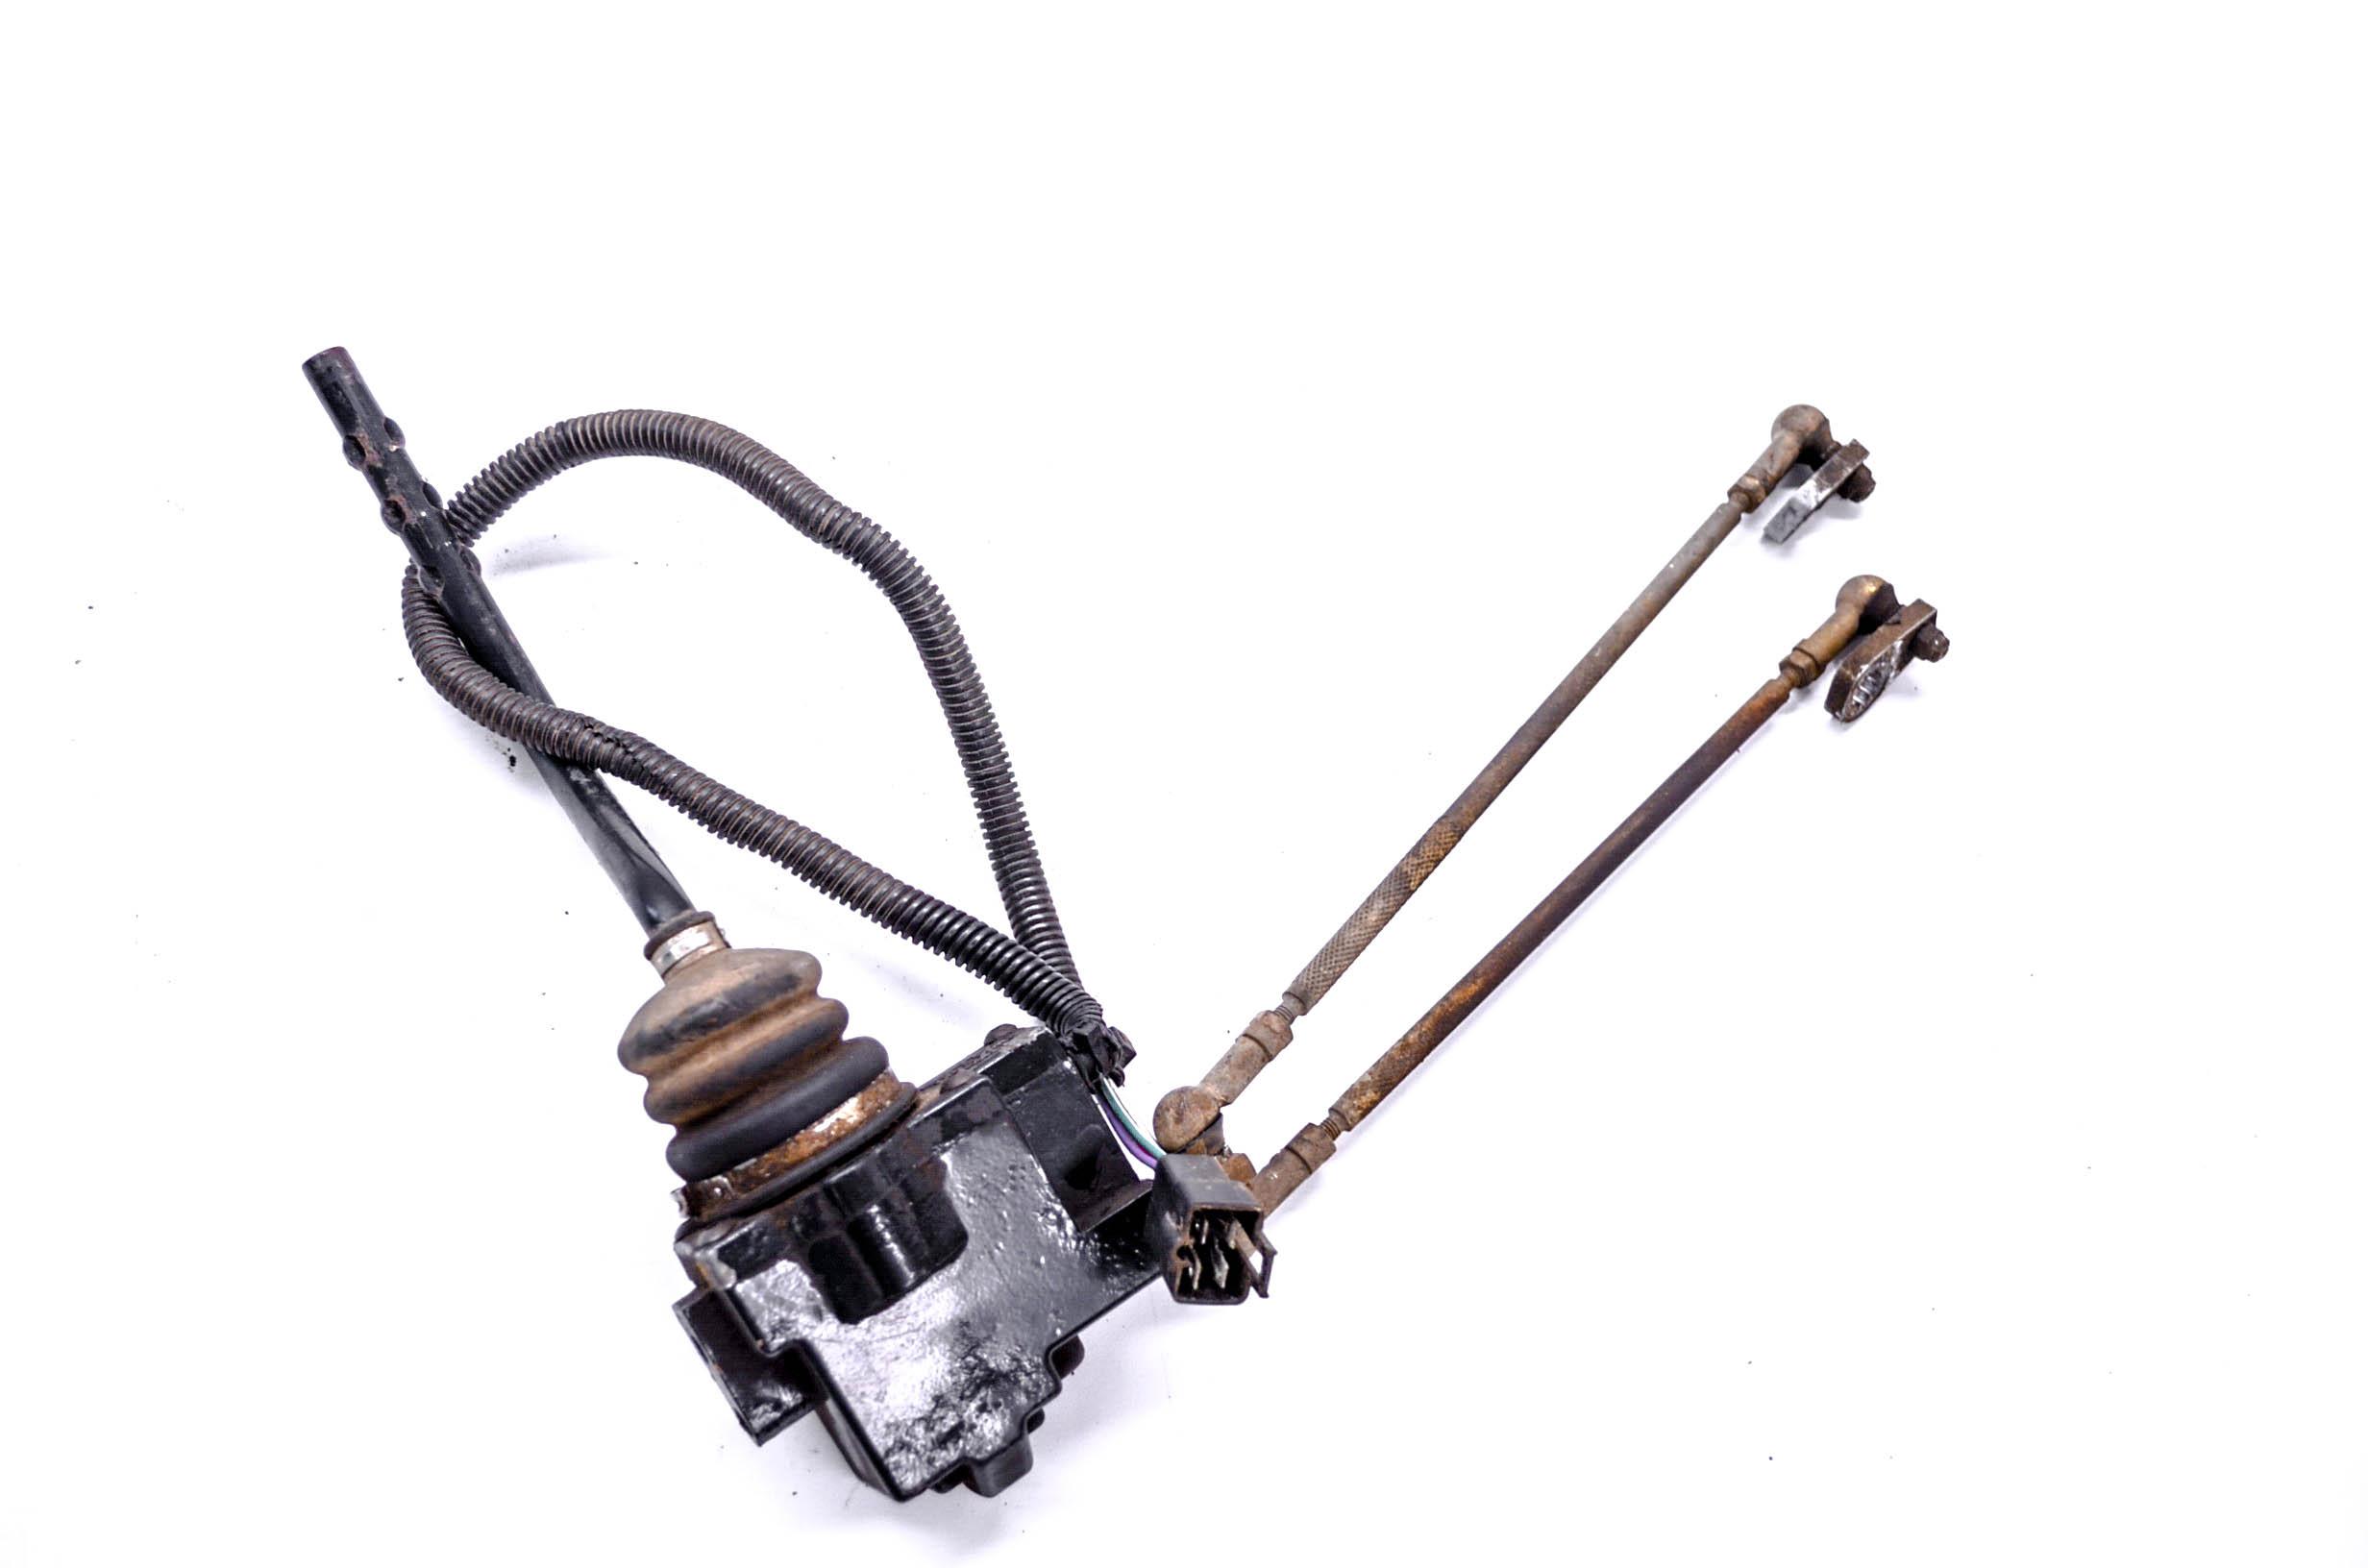 96 Polaris Xplorer 400L 4x4 Gear Select Shift Lever